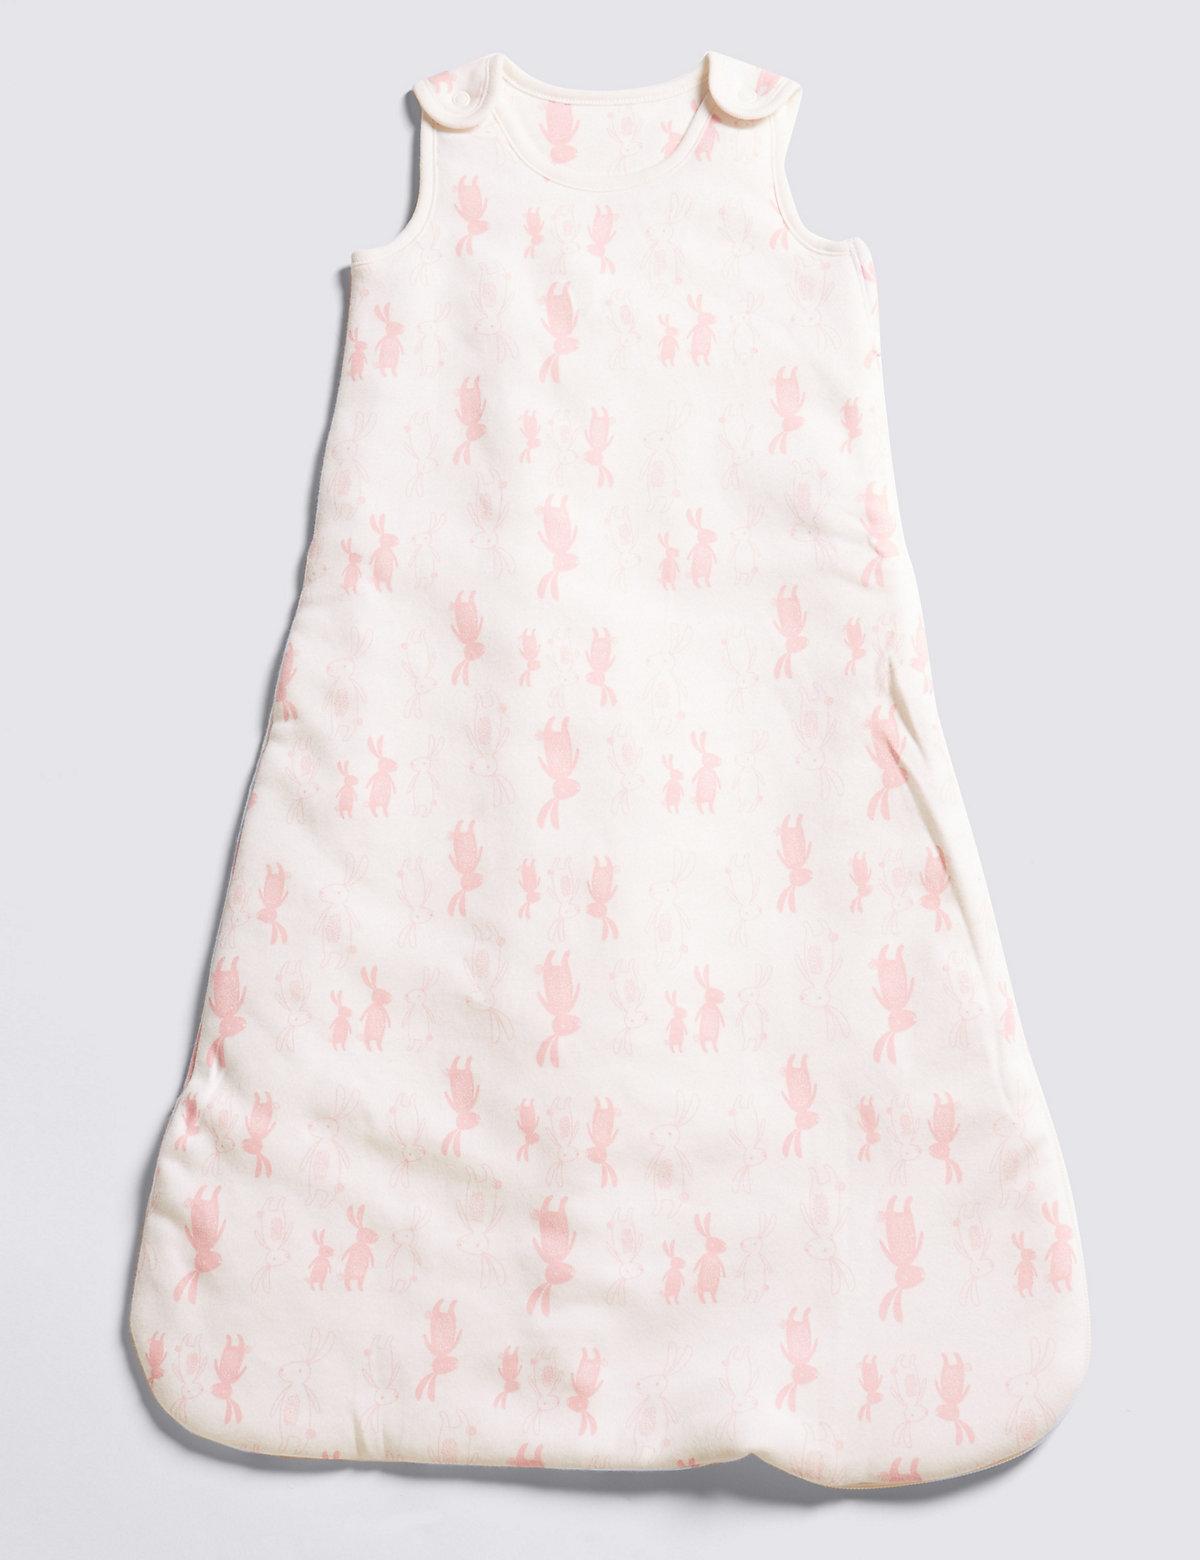 Girls' Rabbit 1.5 Tog Sleeping Bag